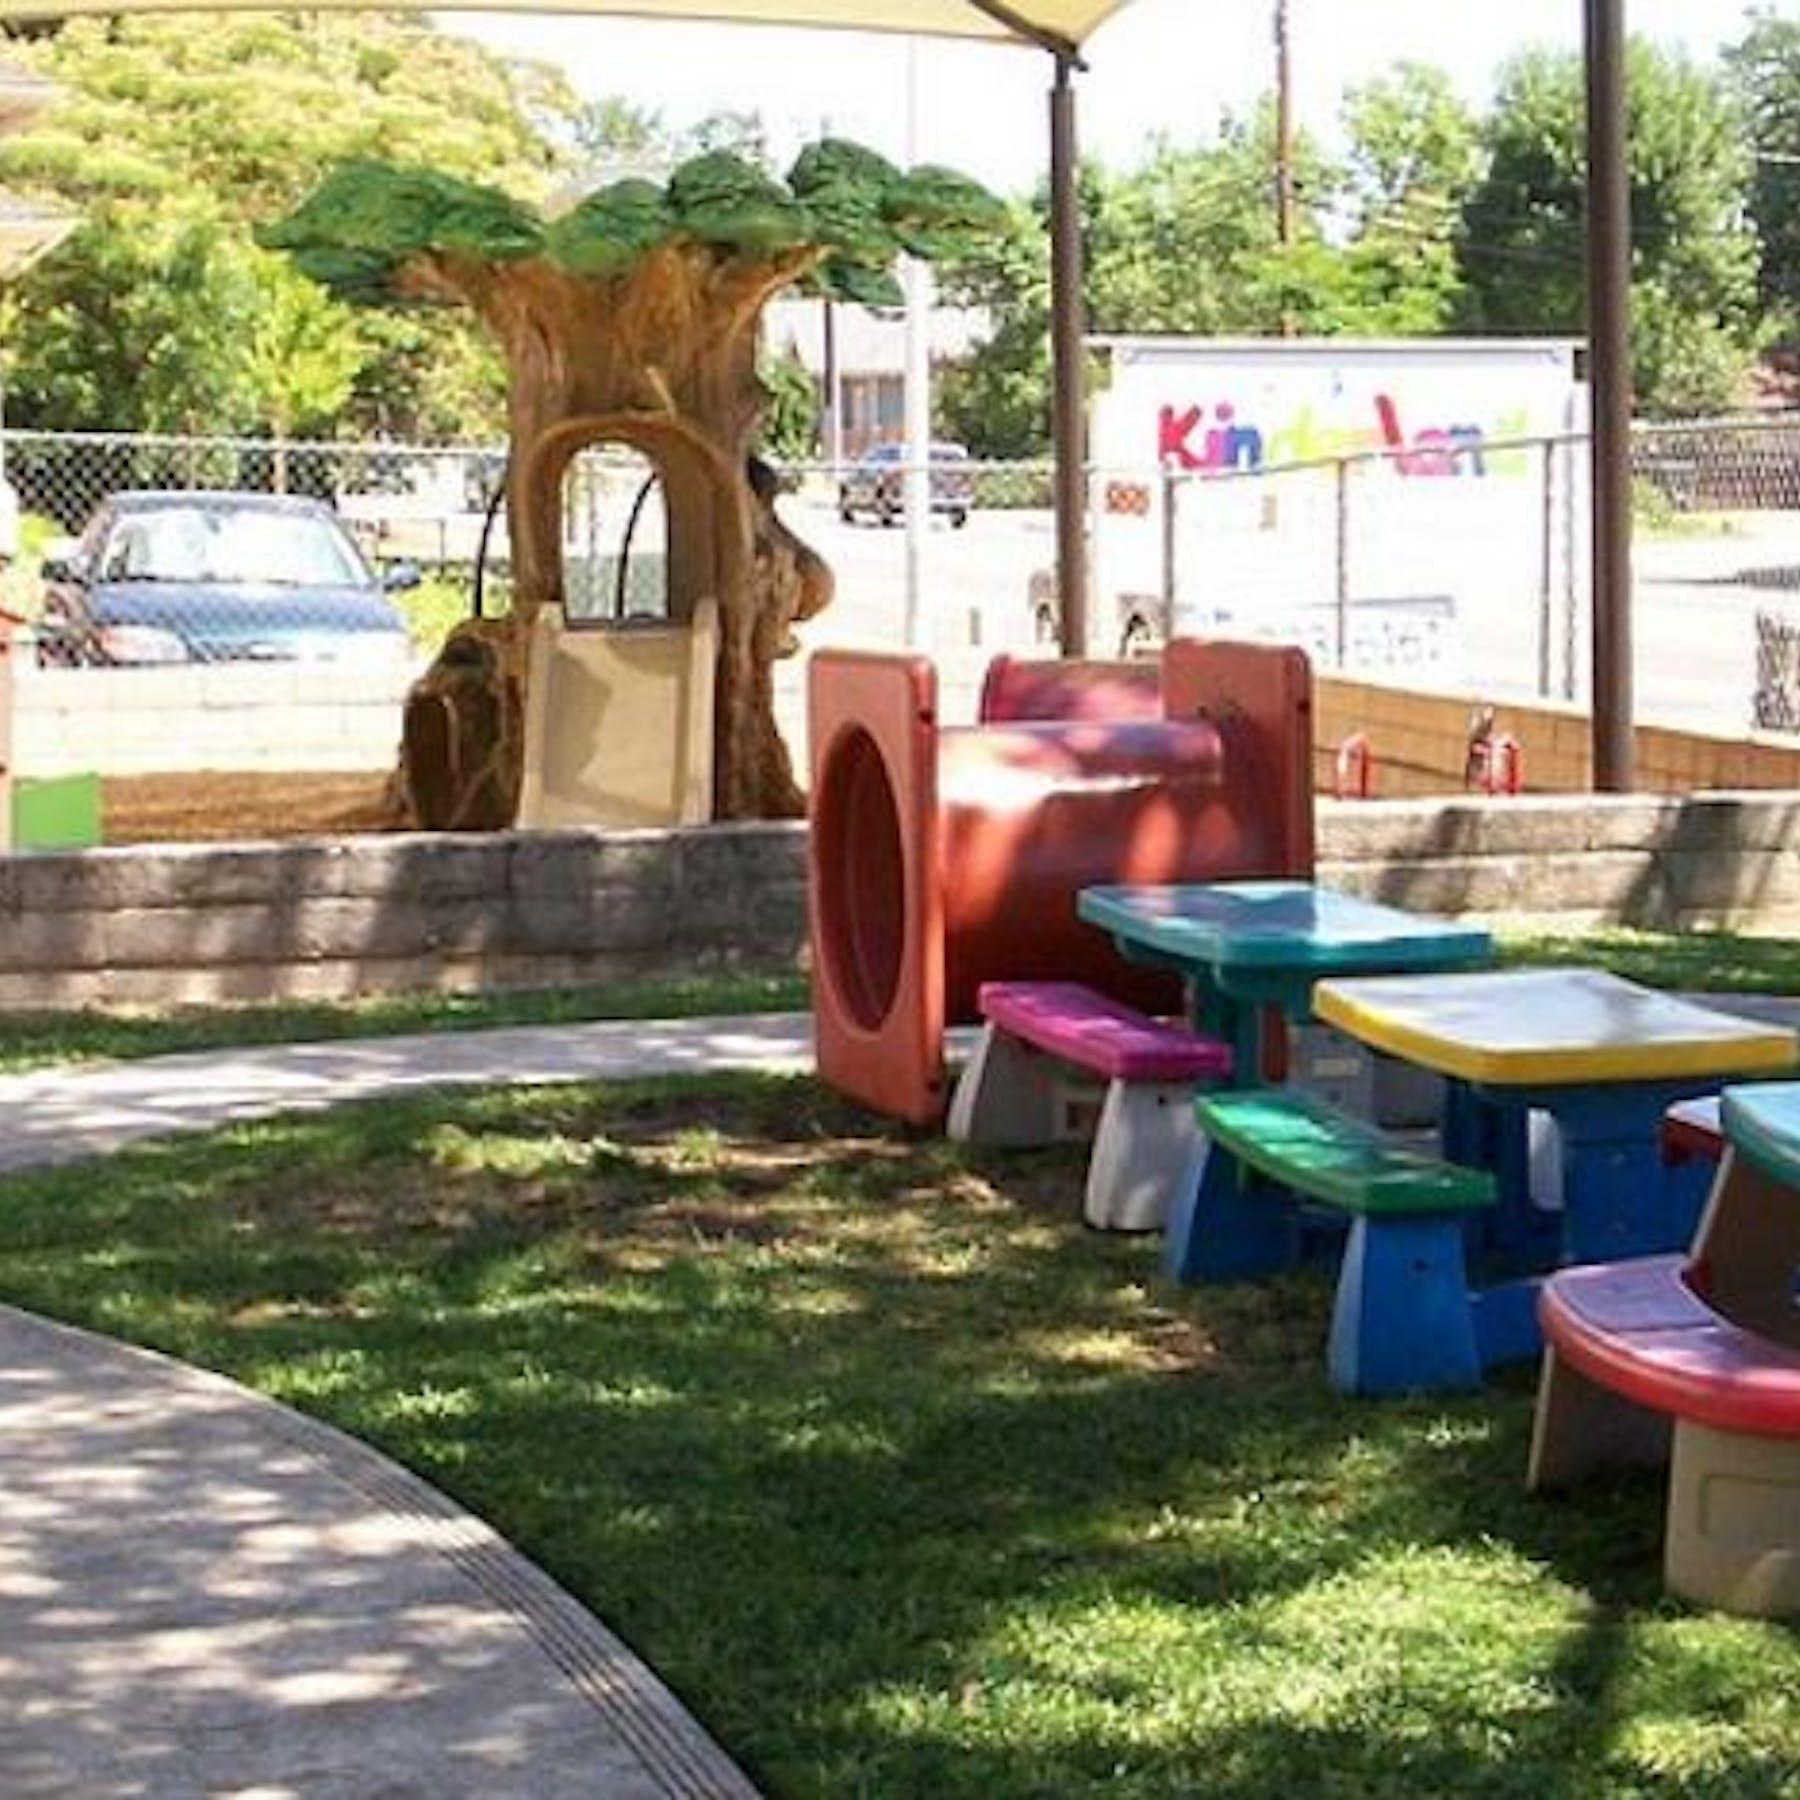 Kinderland - Daycare in Redding, CA - Winnie